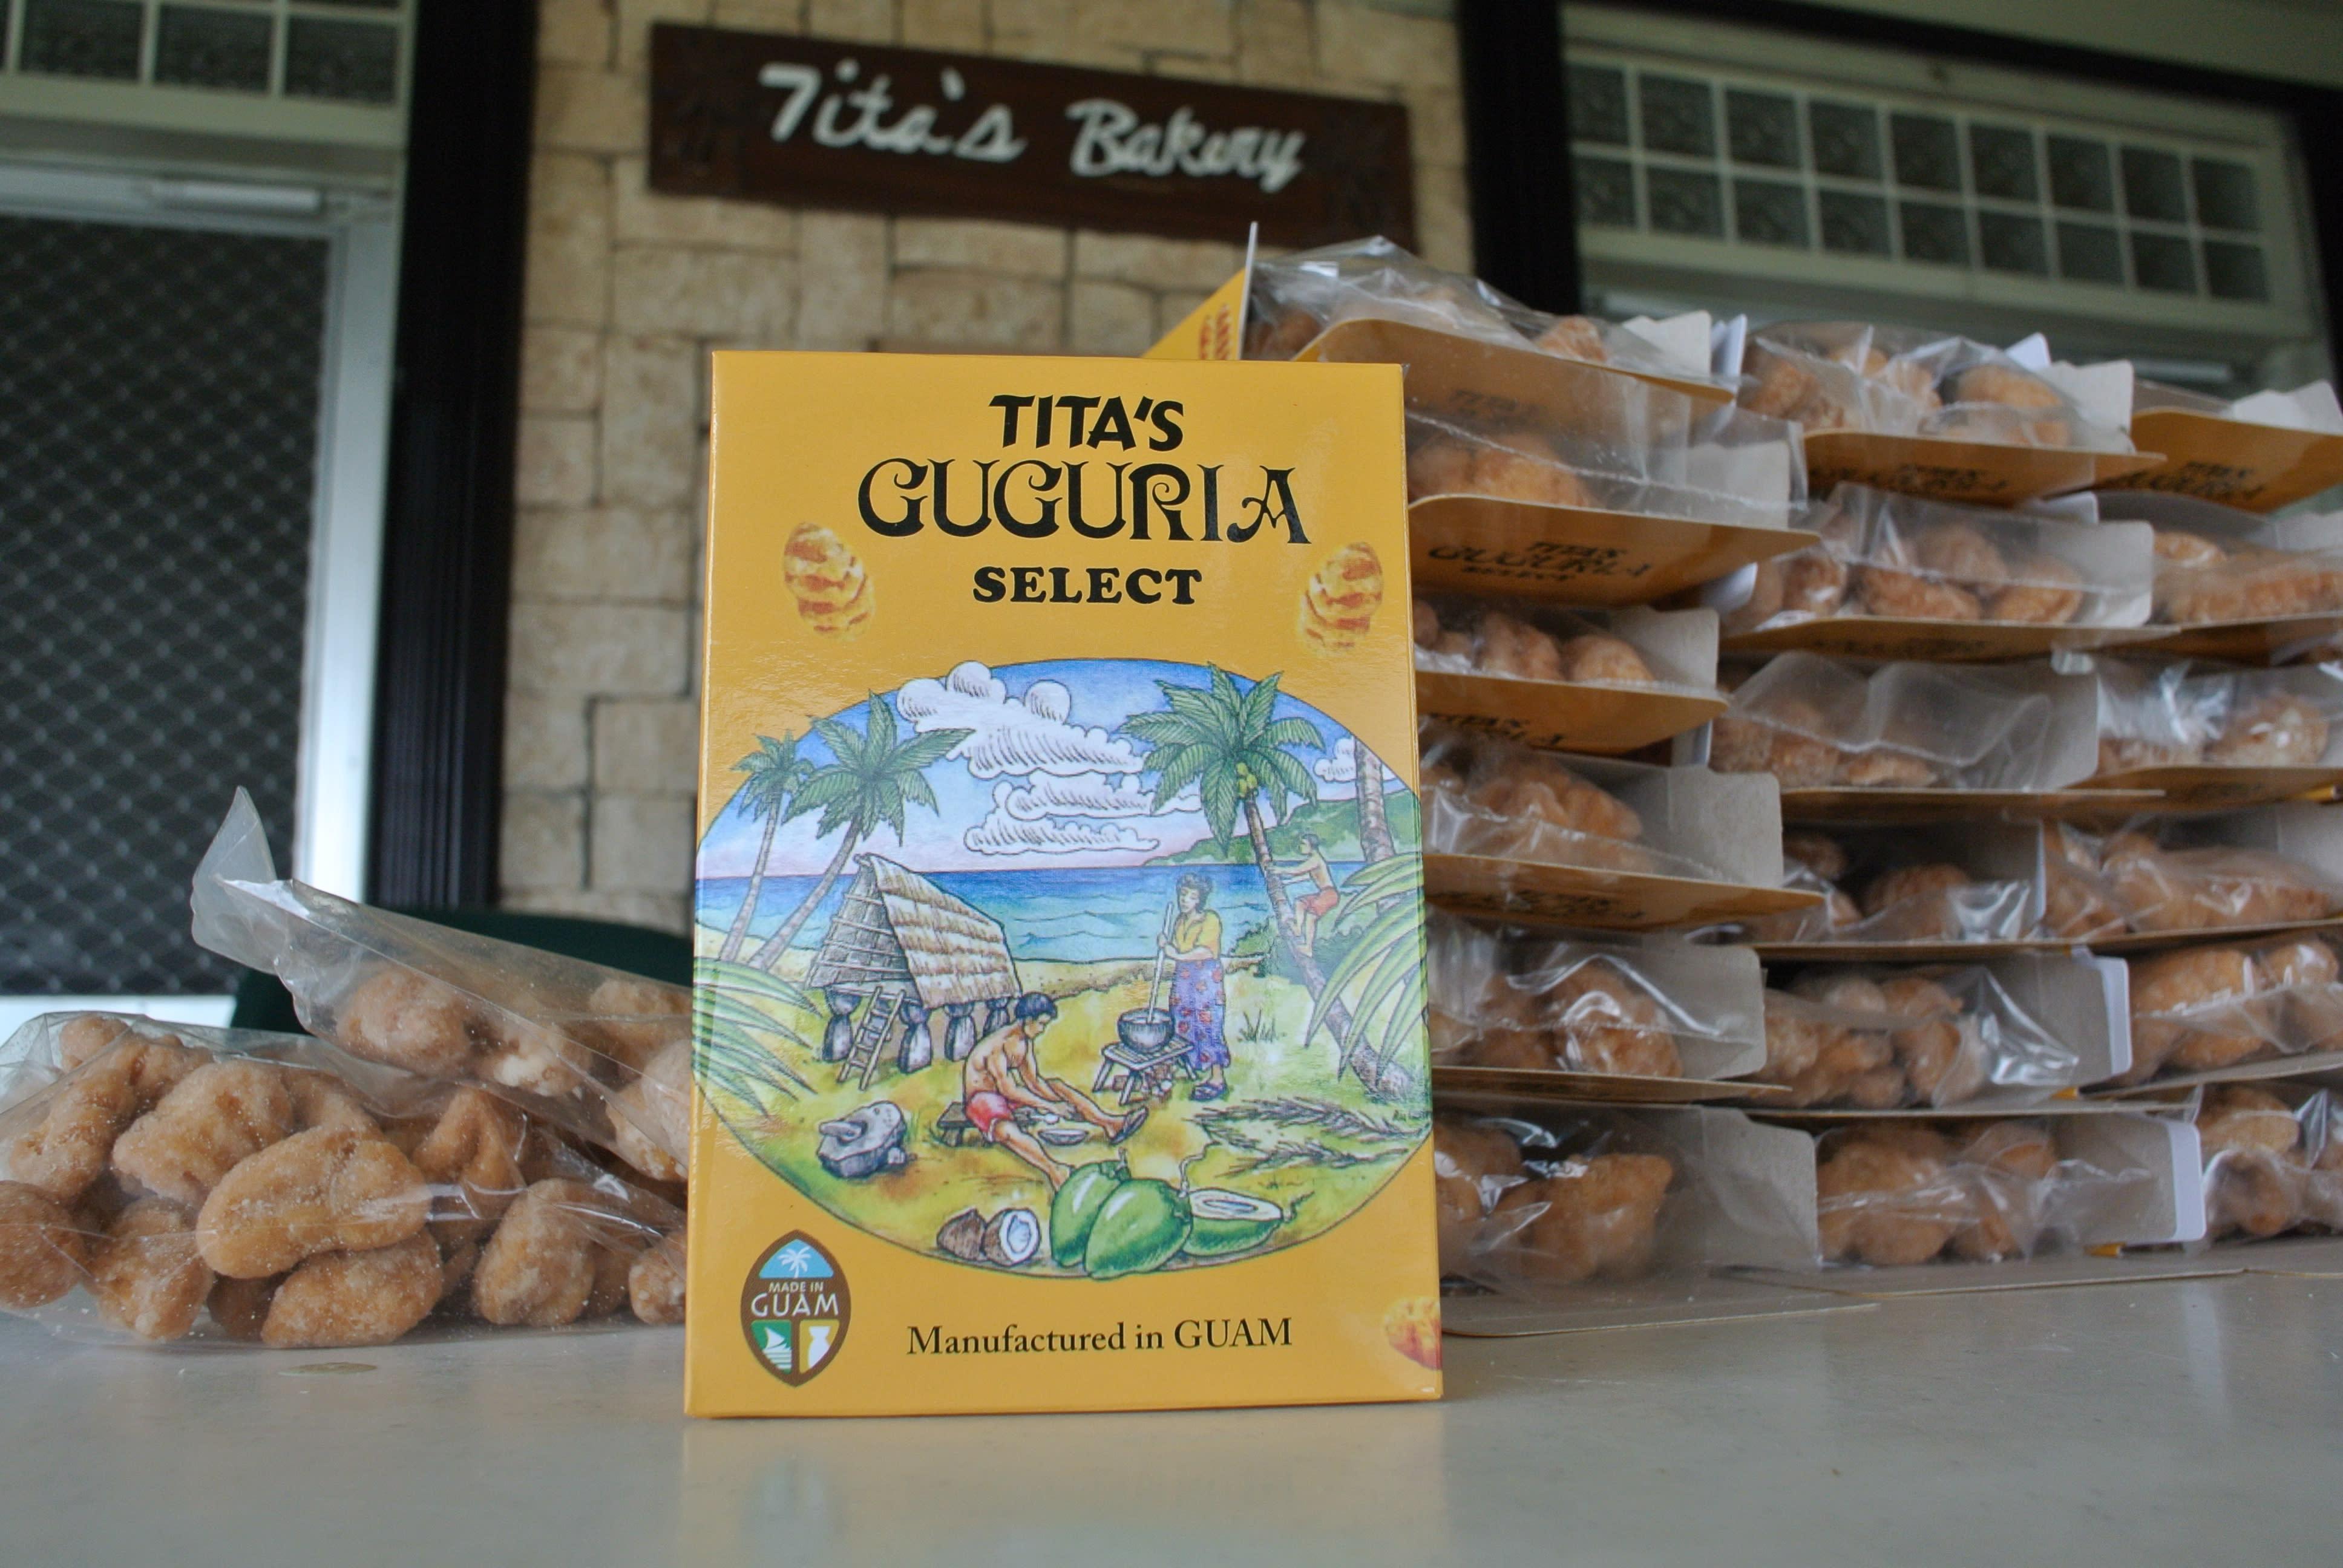 Tita's Guguria